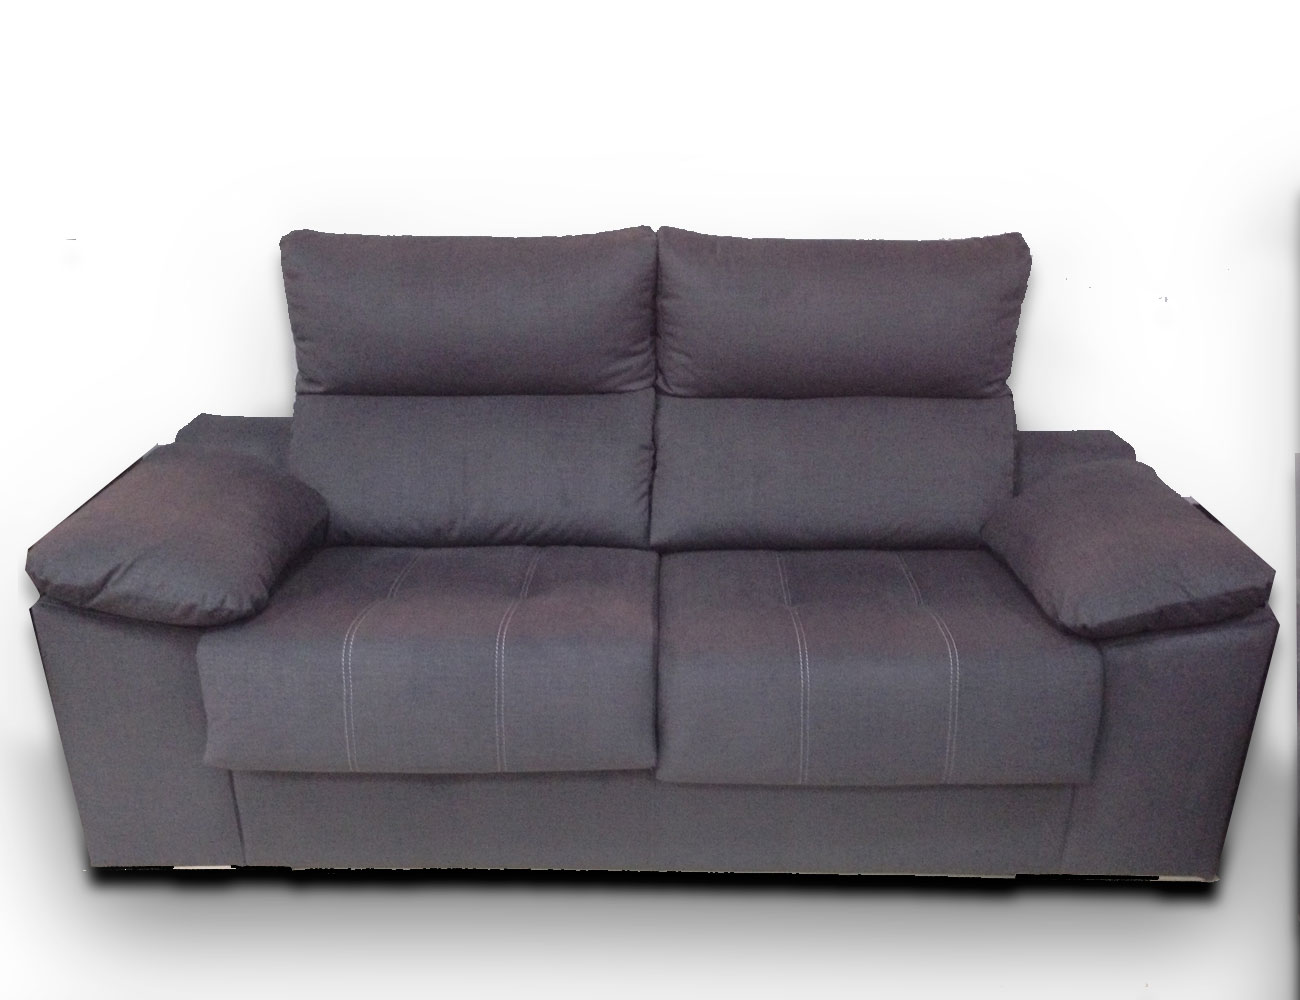 Sofa 3 plazas9